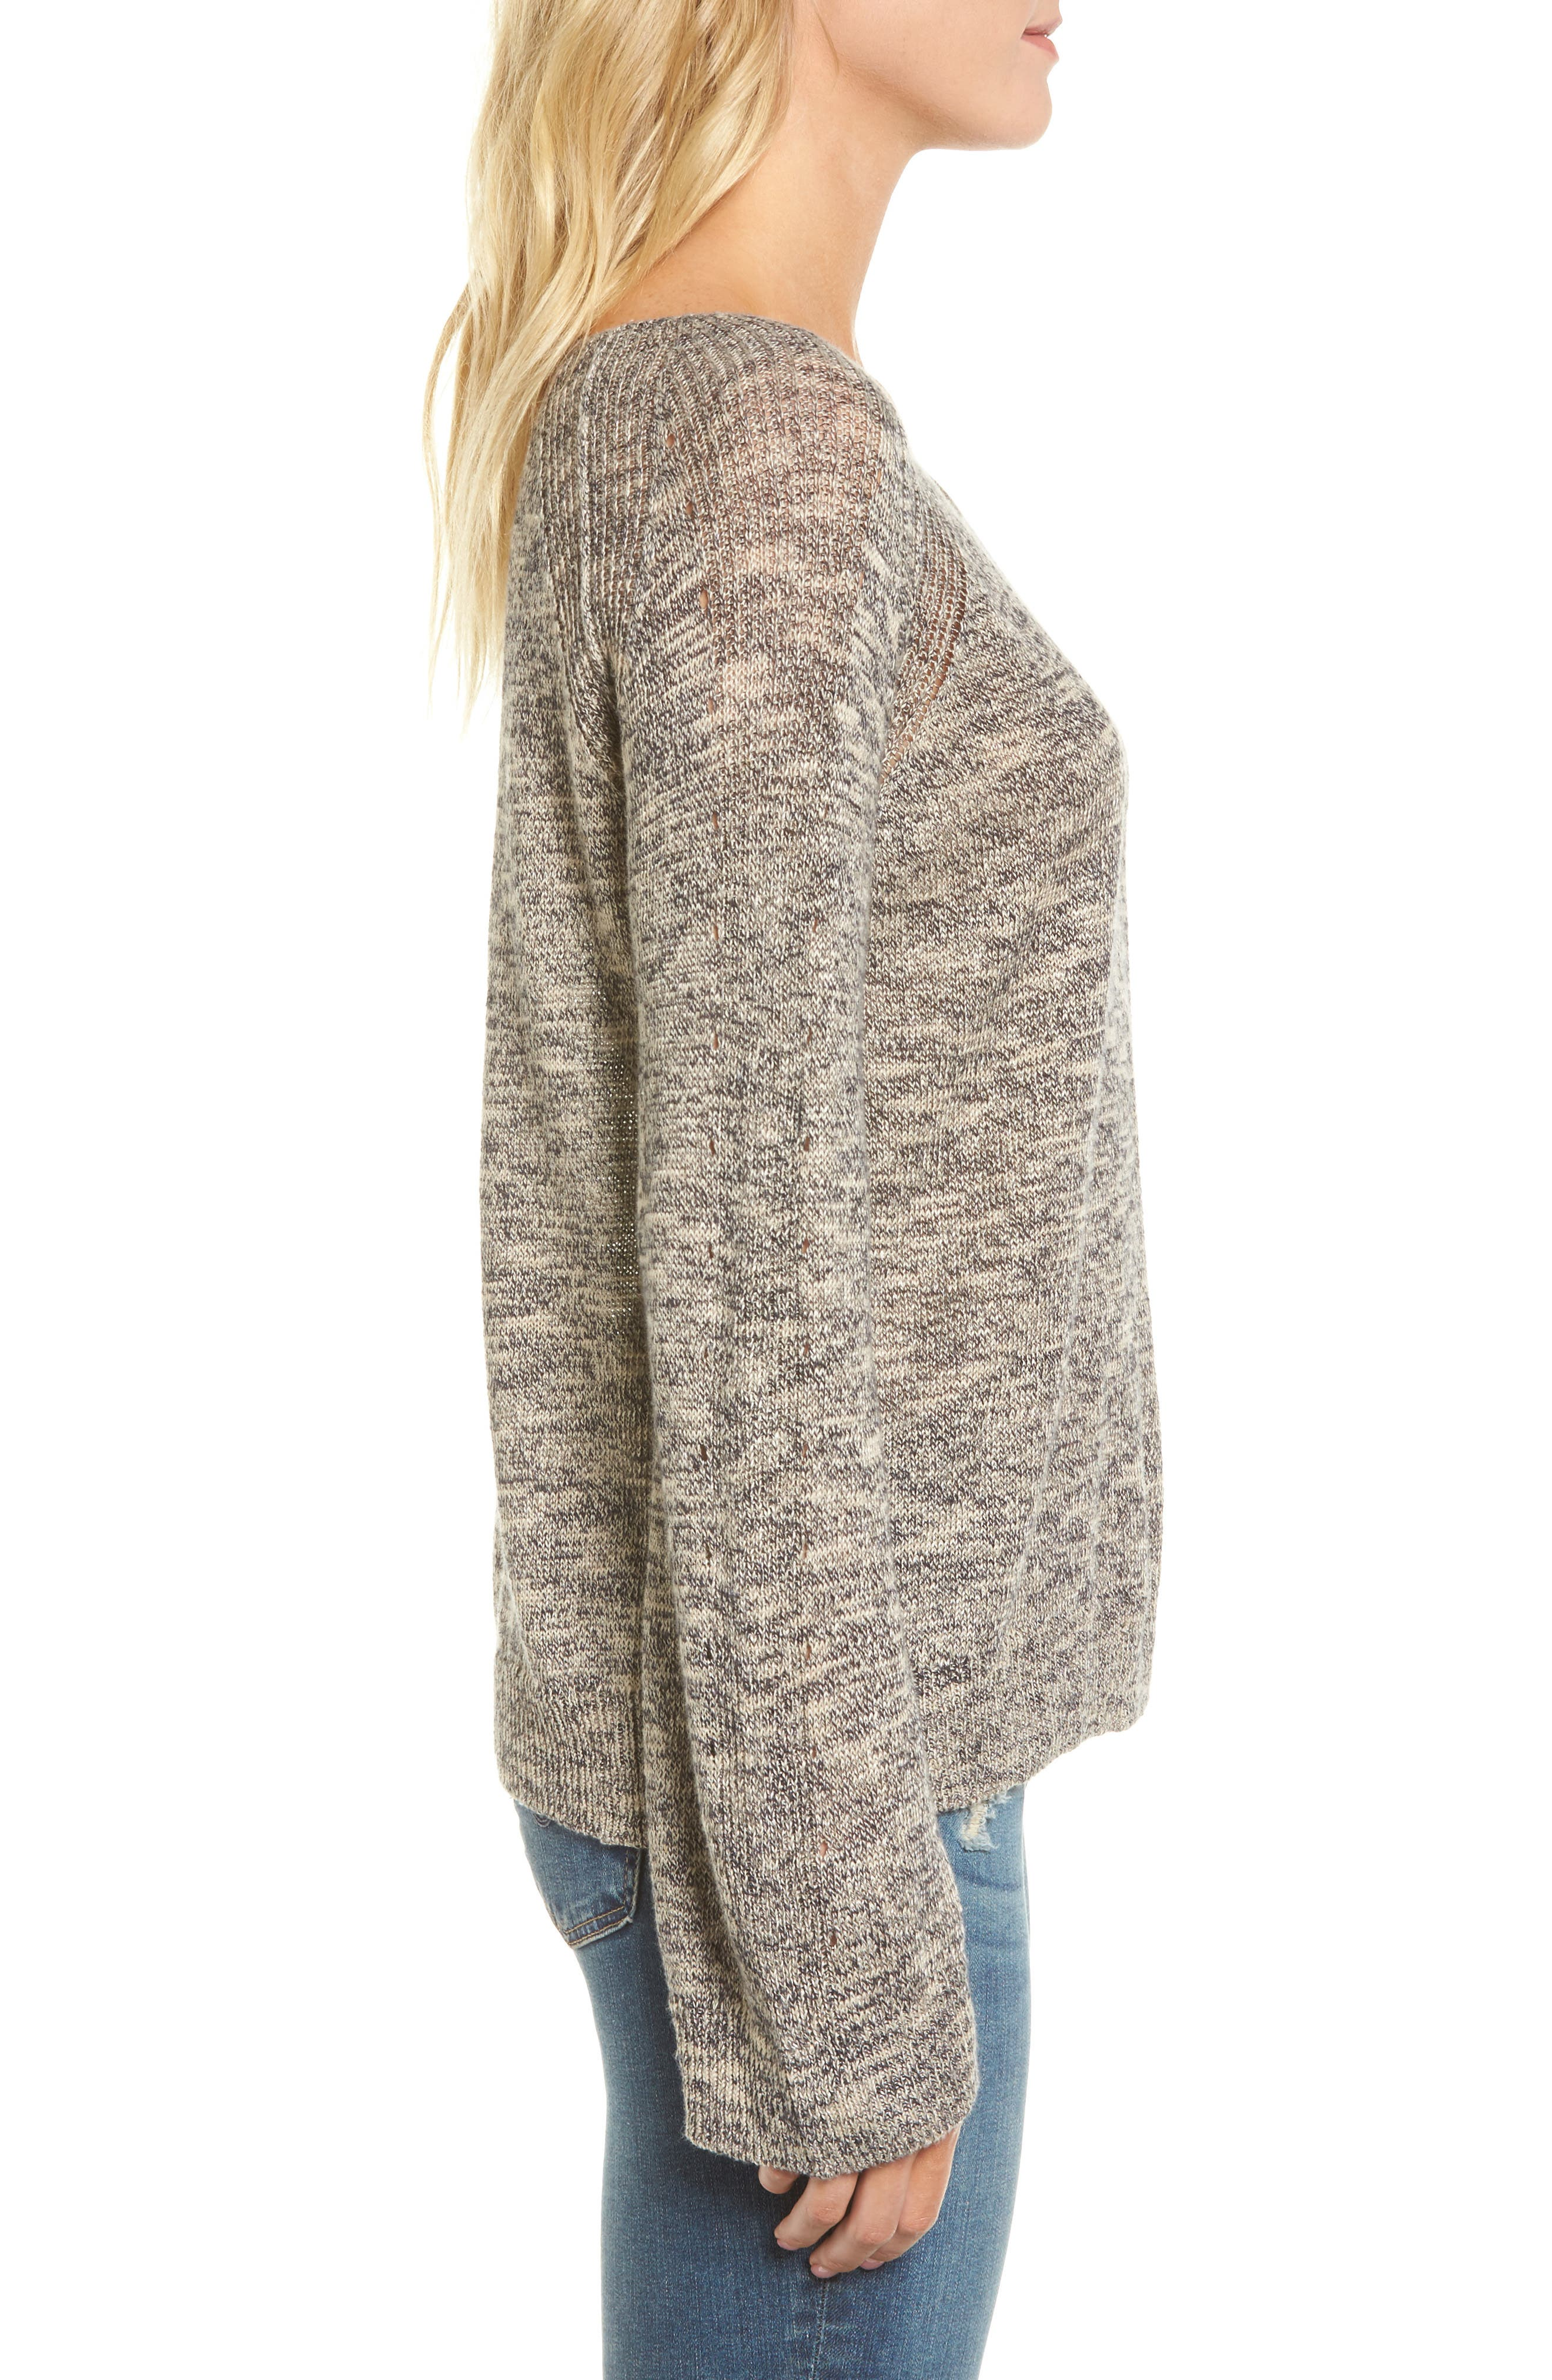 Flora Sweater,                             Alternate thumbnail 3, color,                             Speckled Navy/ Beige